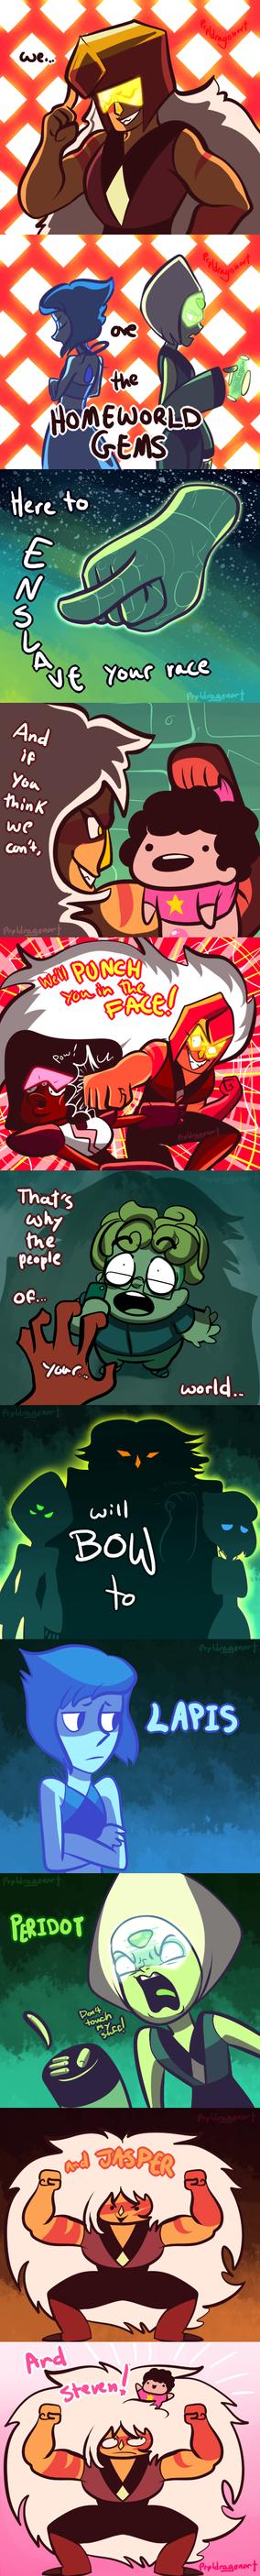 We... are the Homeworld Gems! by prpldragonart